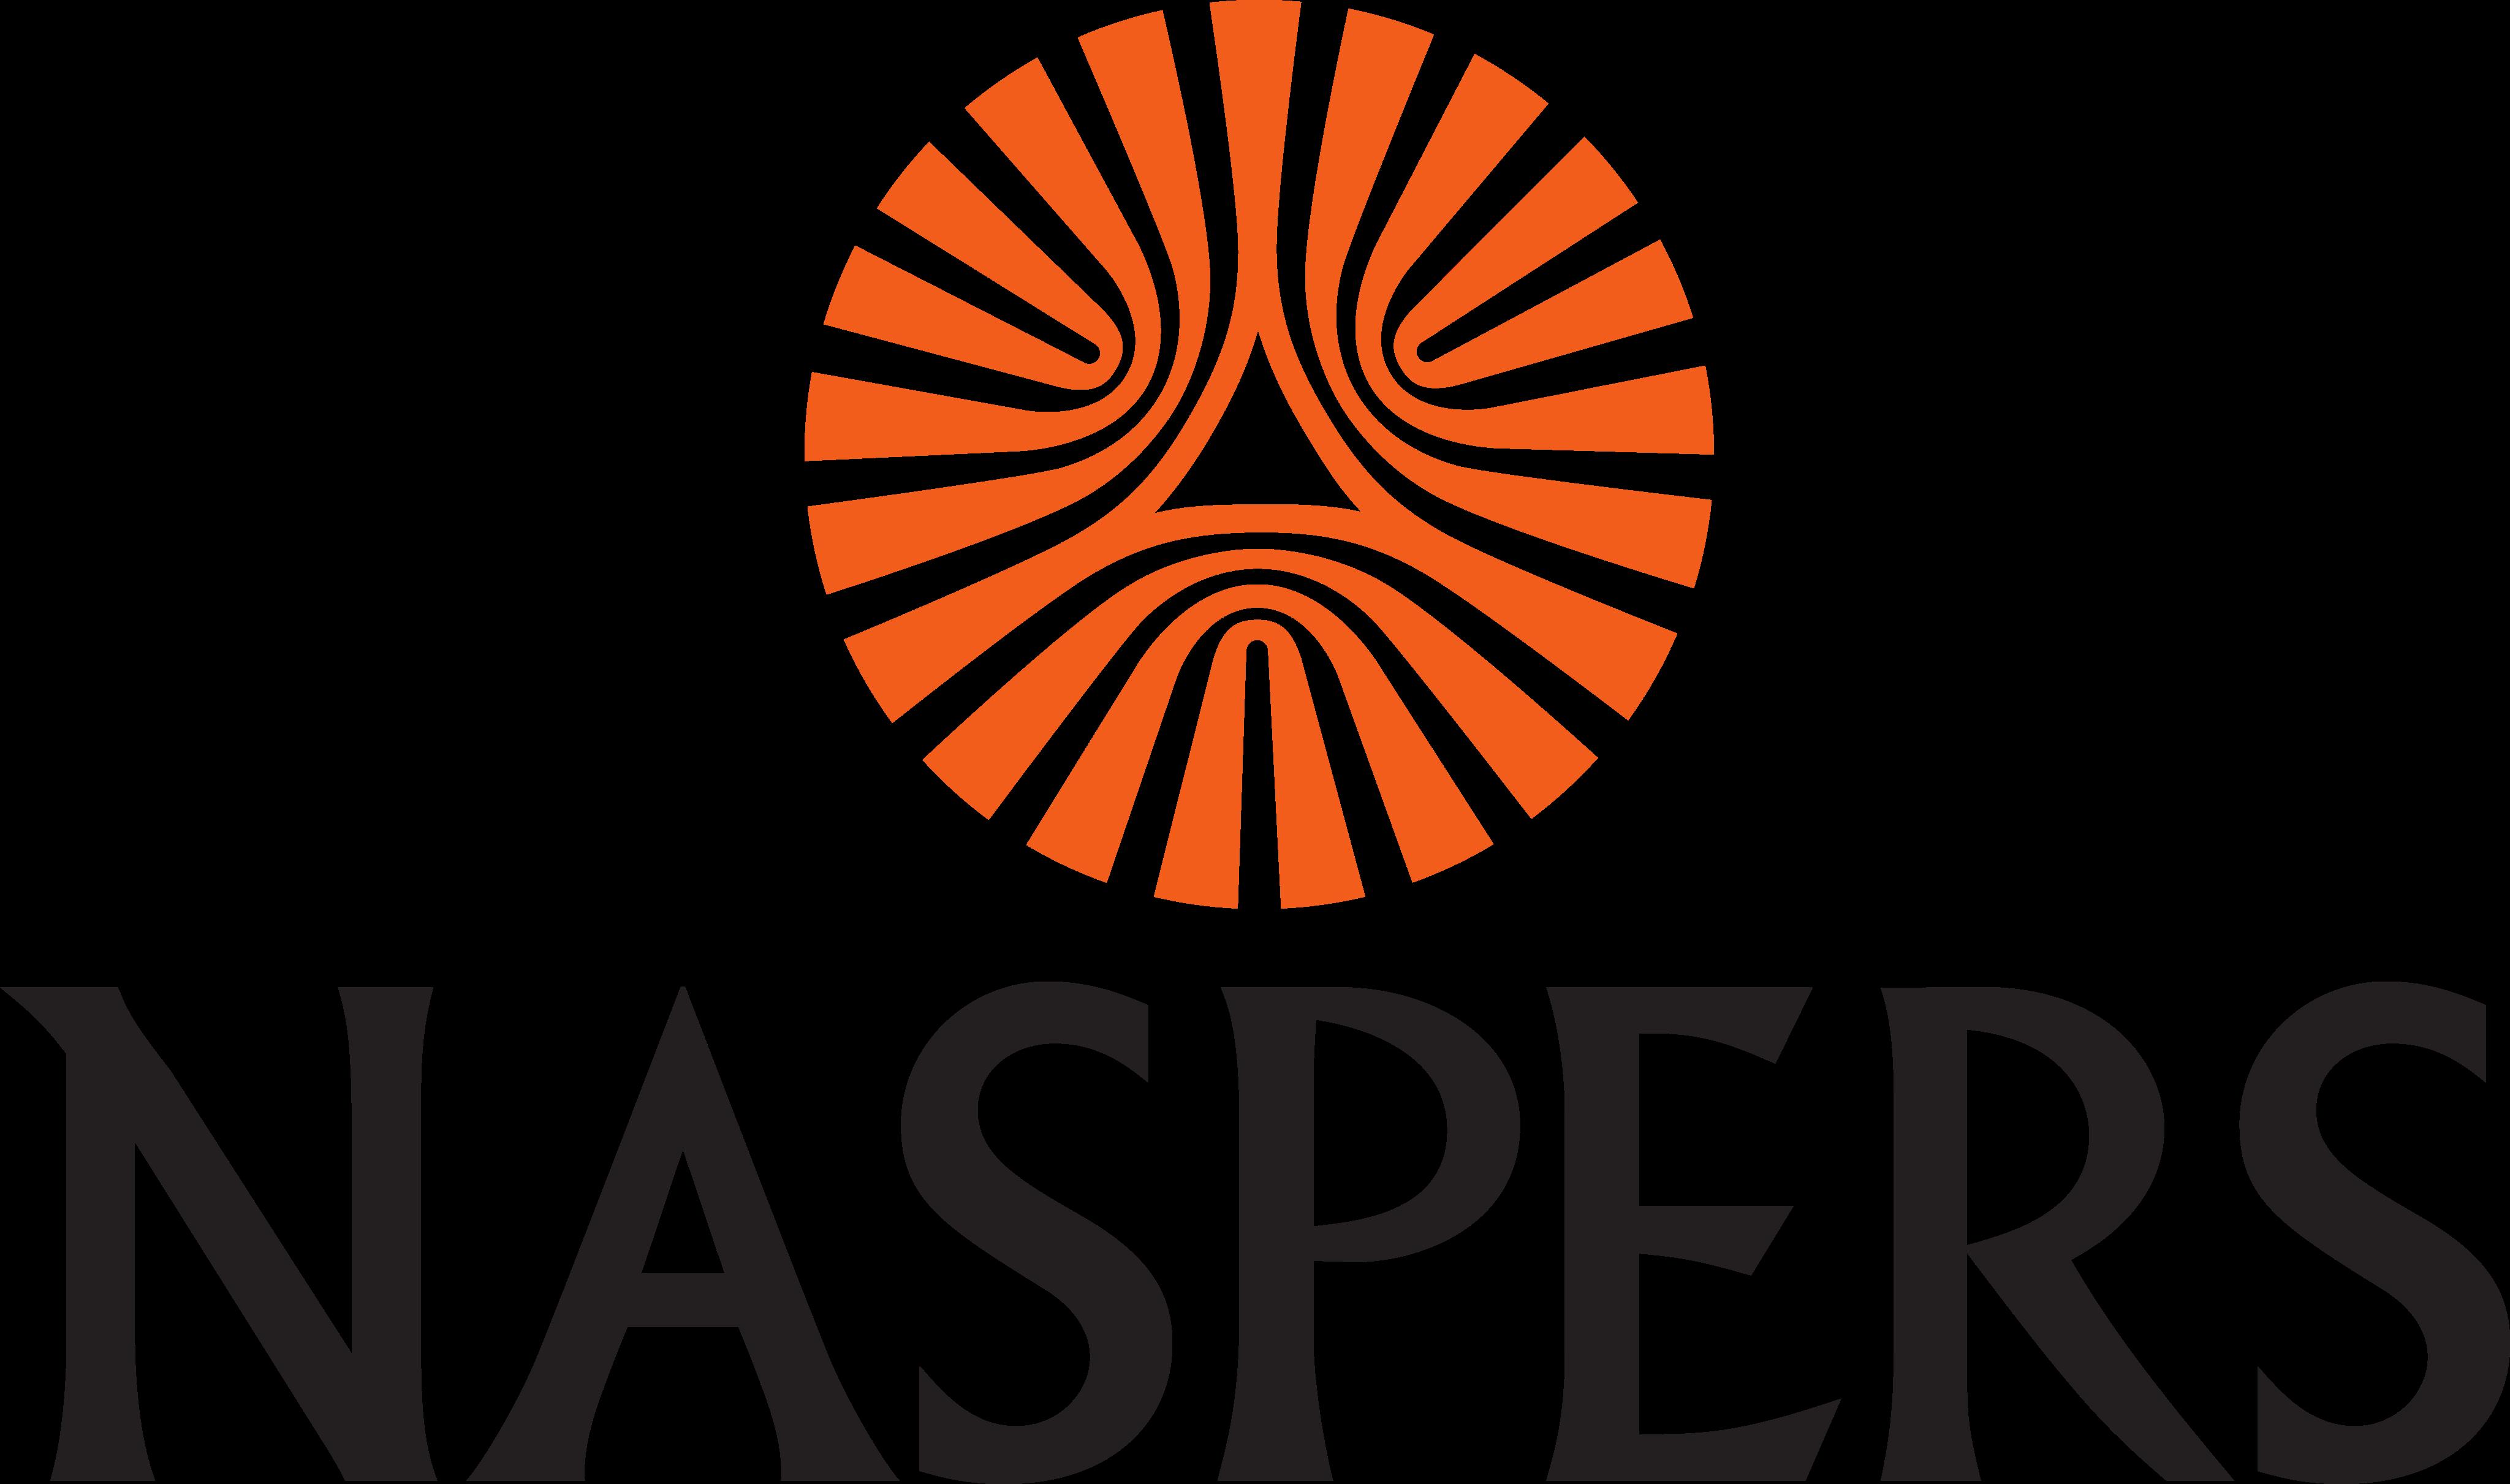 naspers logo 1 - Naspers Logo